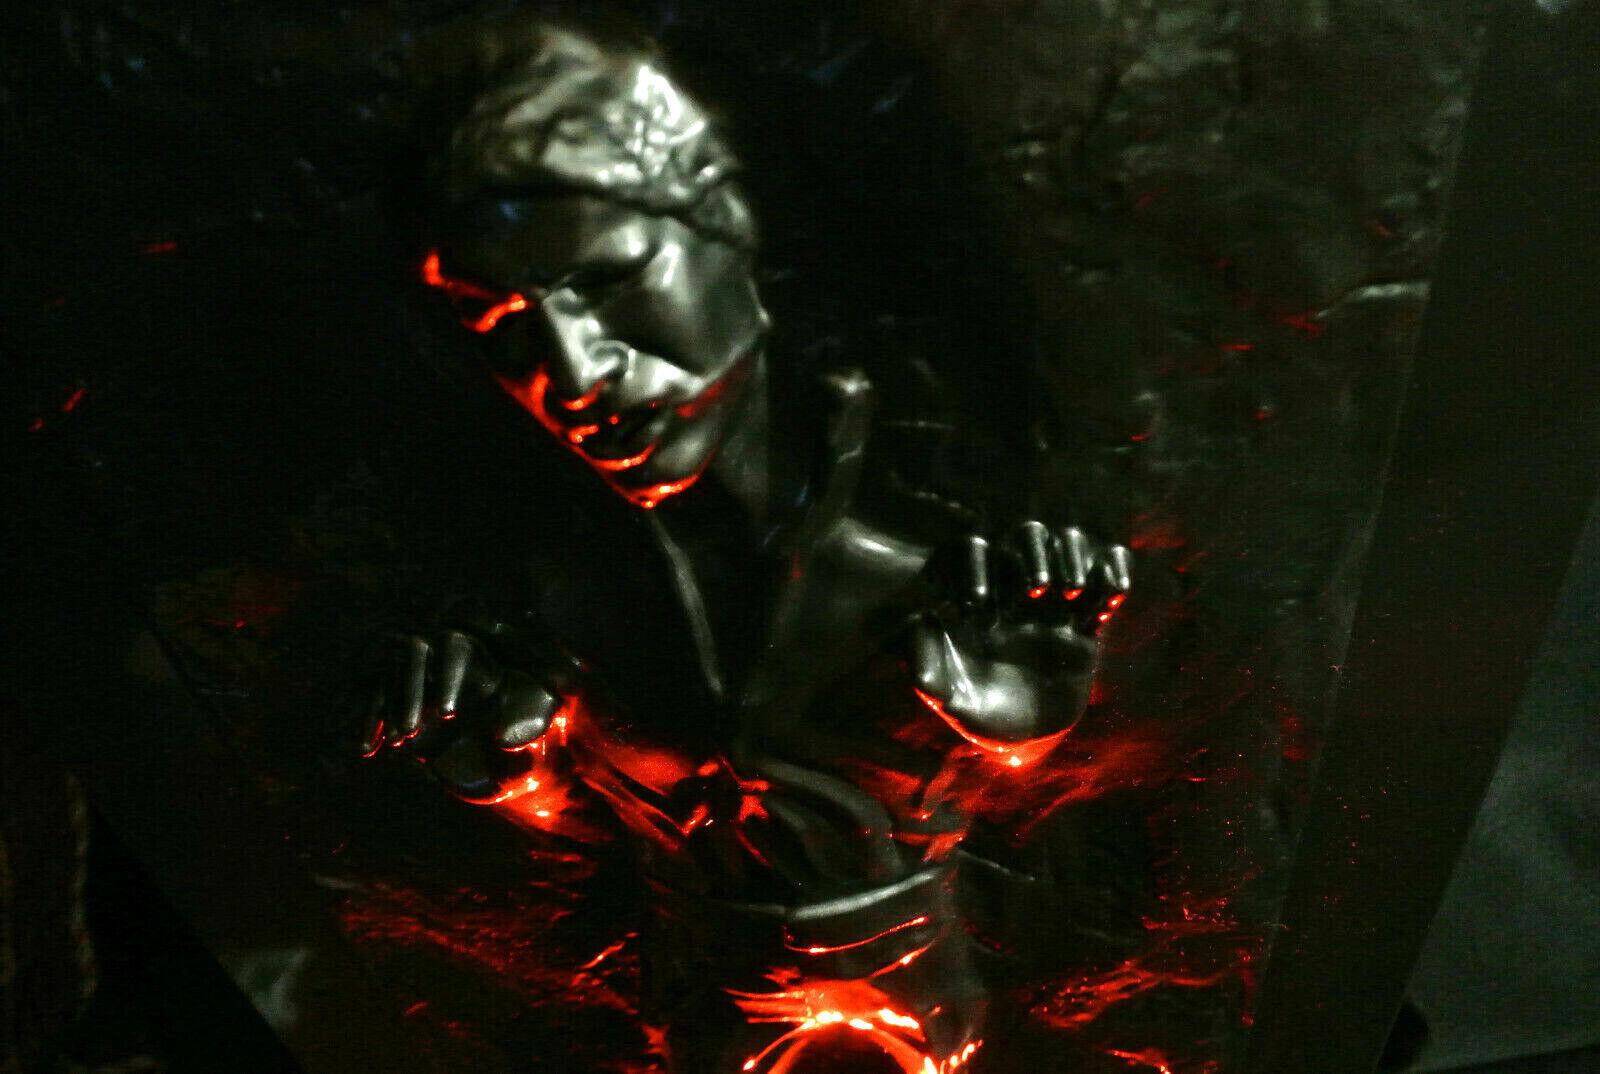 "18"" 1/4 Star Wars Light Up Han Solo Carbonite fr Hot toys Vader Premium Sideshow on eBay thumbnail"